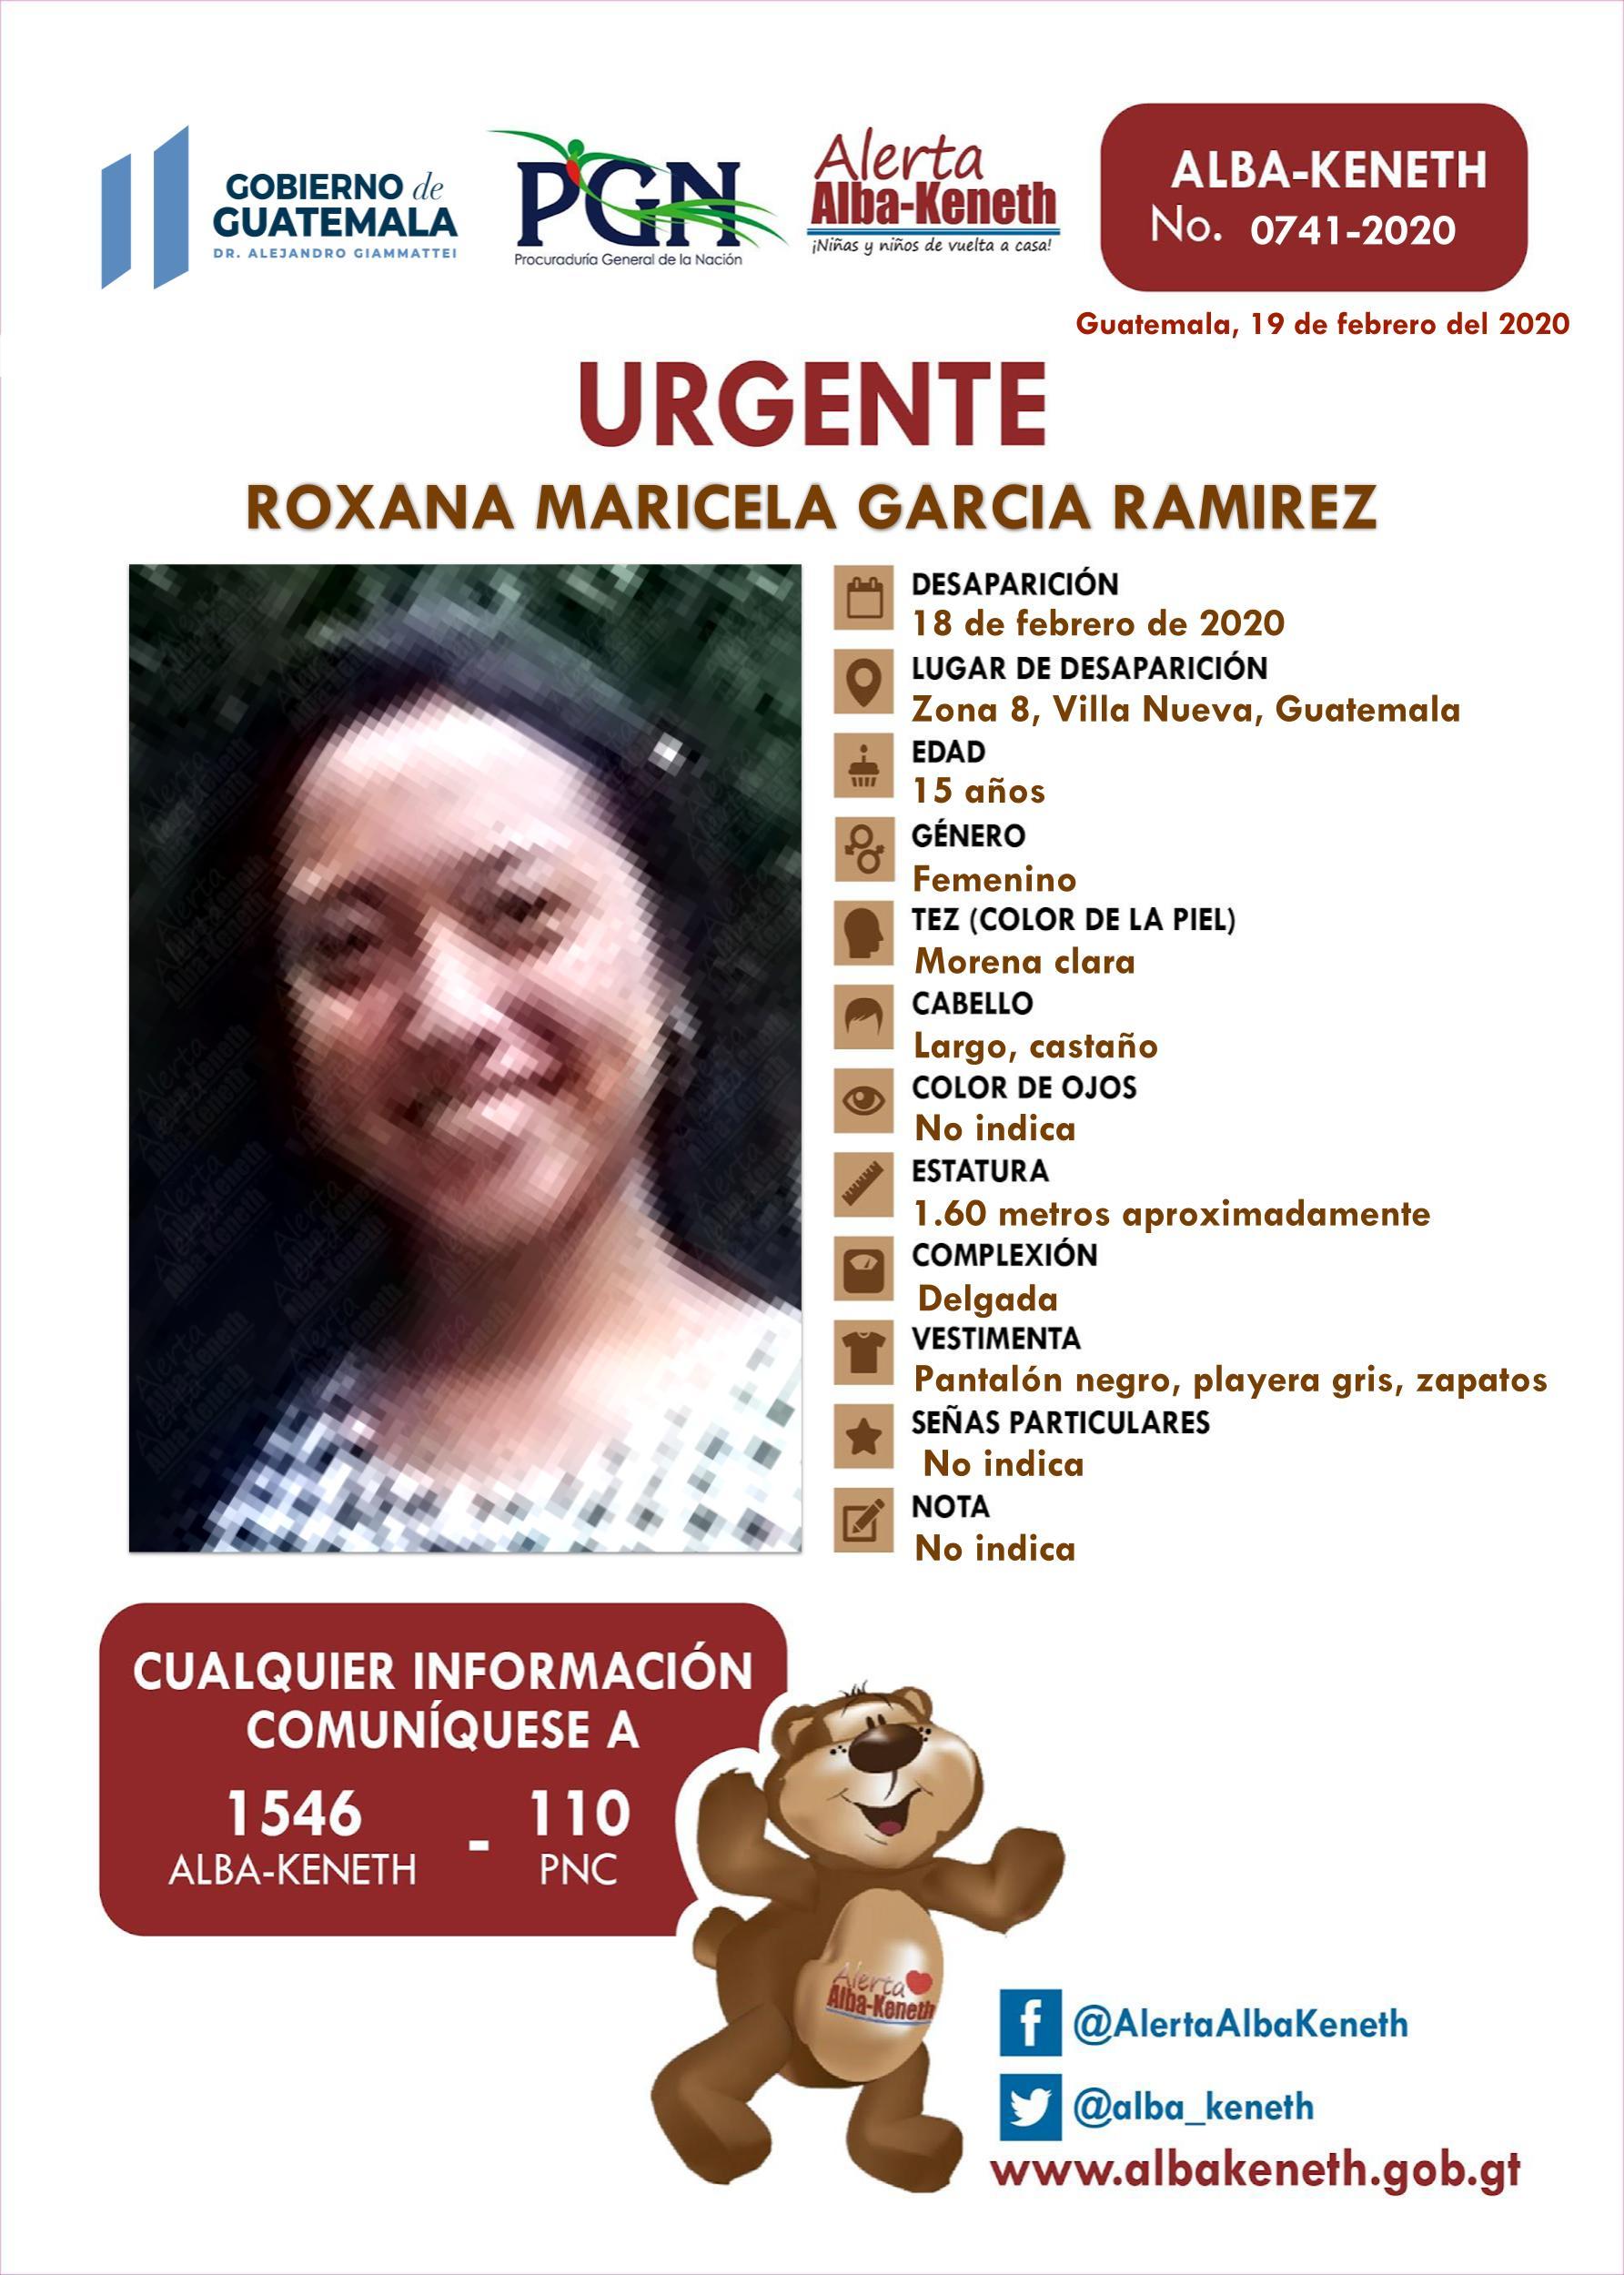 Roxana Maricela Garcia Ramirez